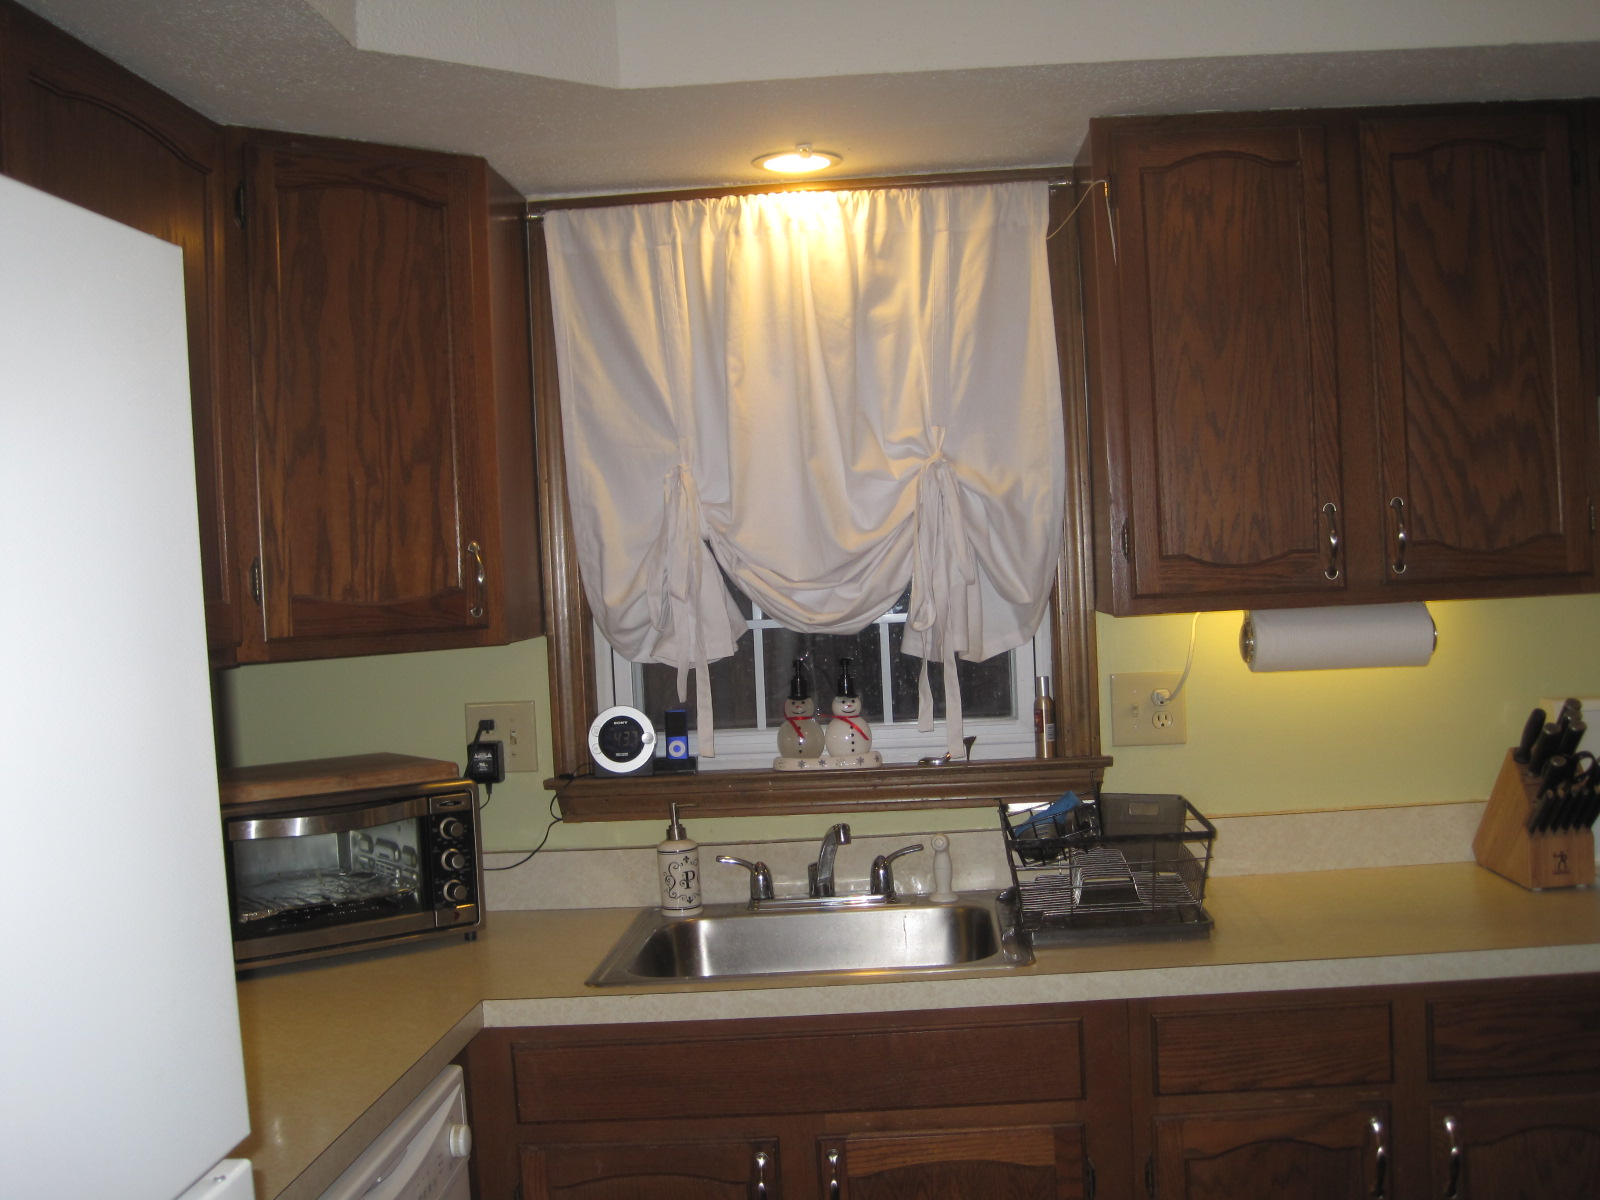 Small kitchen curtains photo - 2